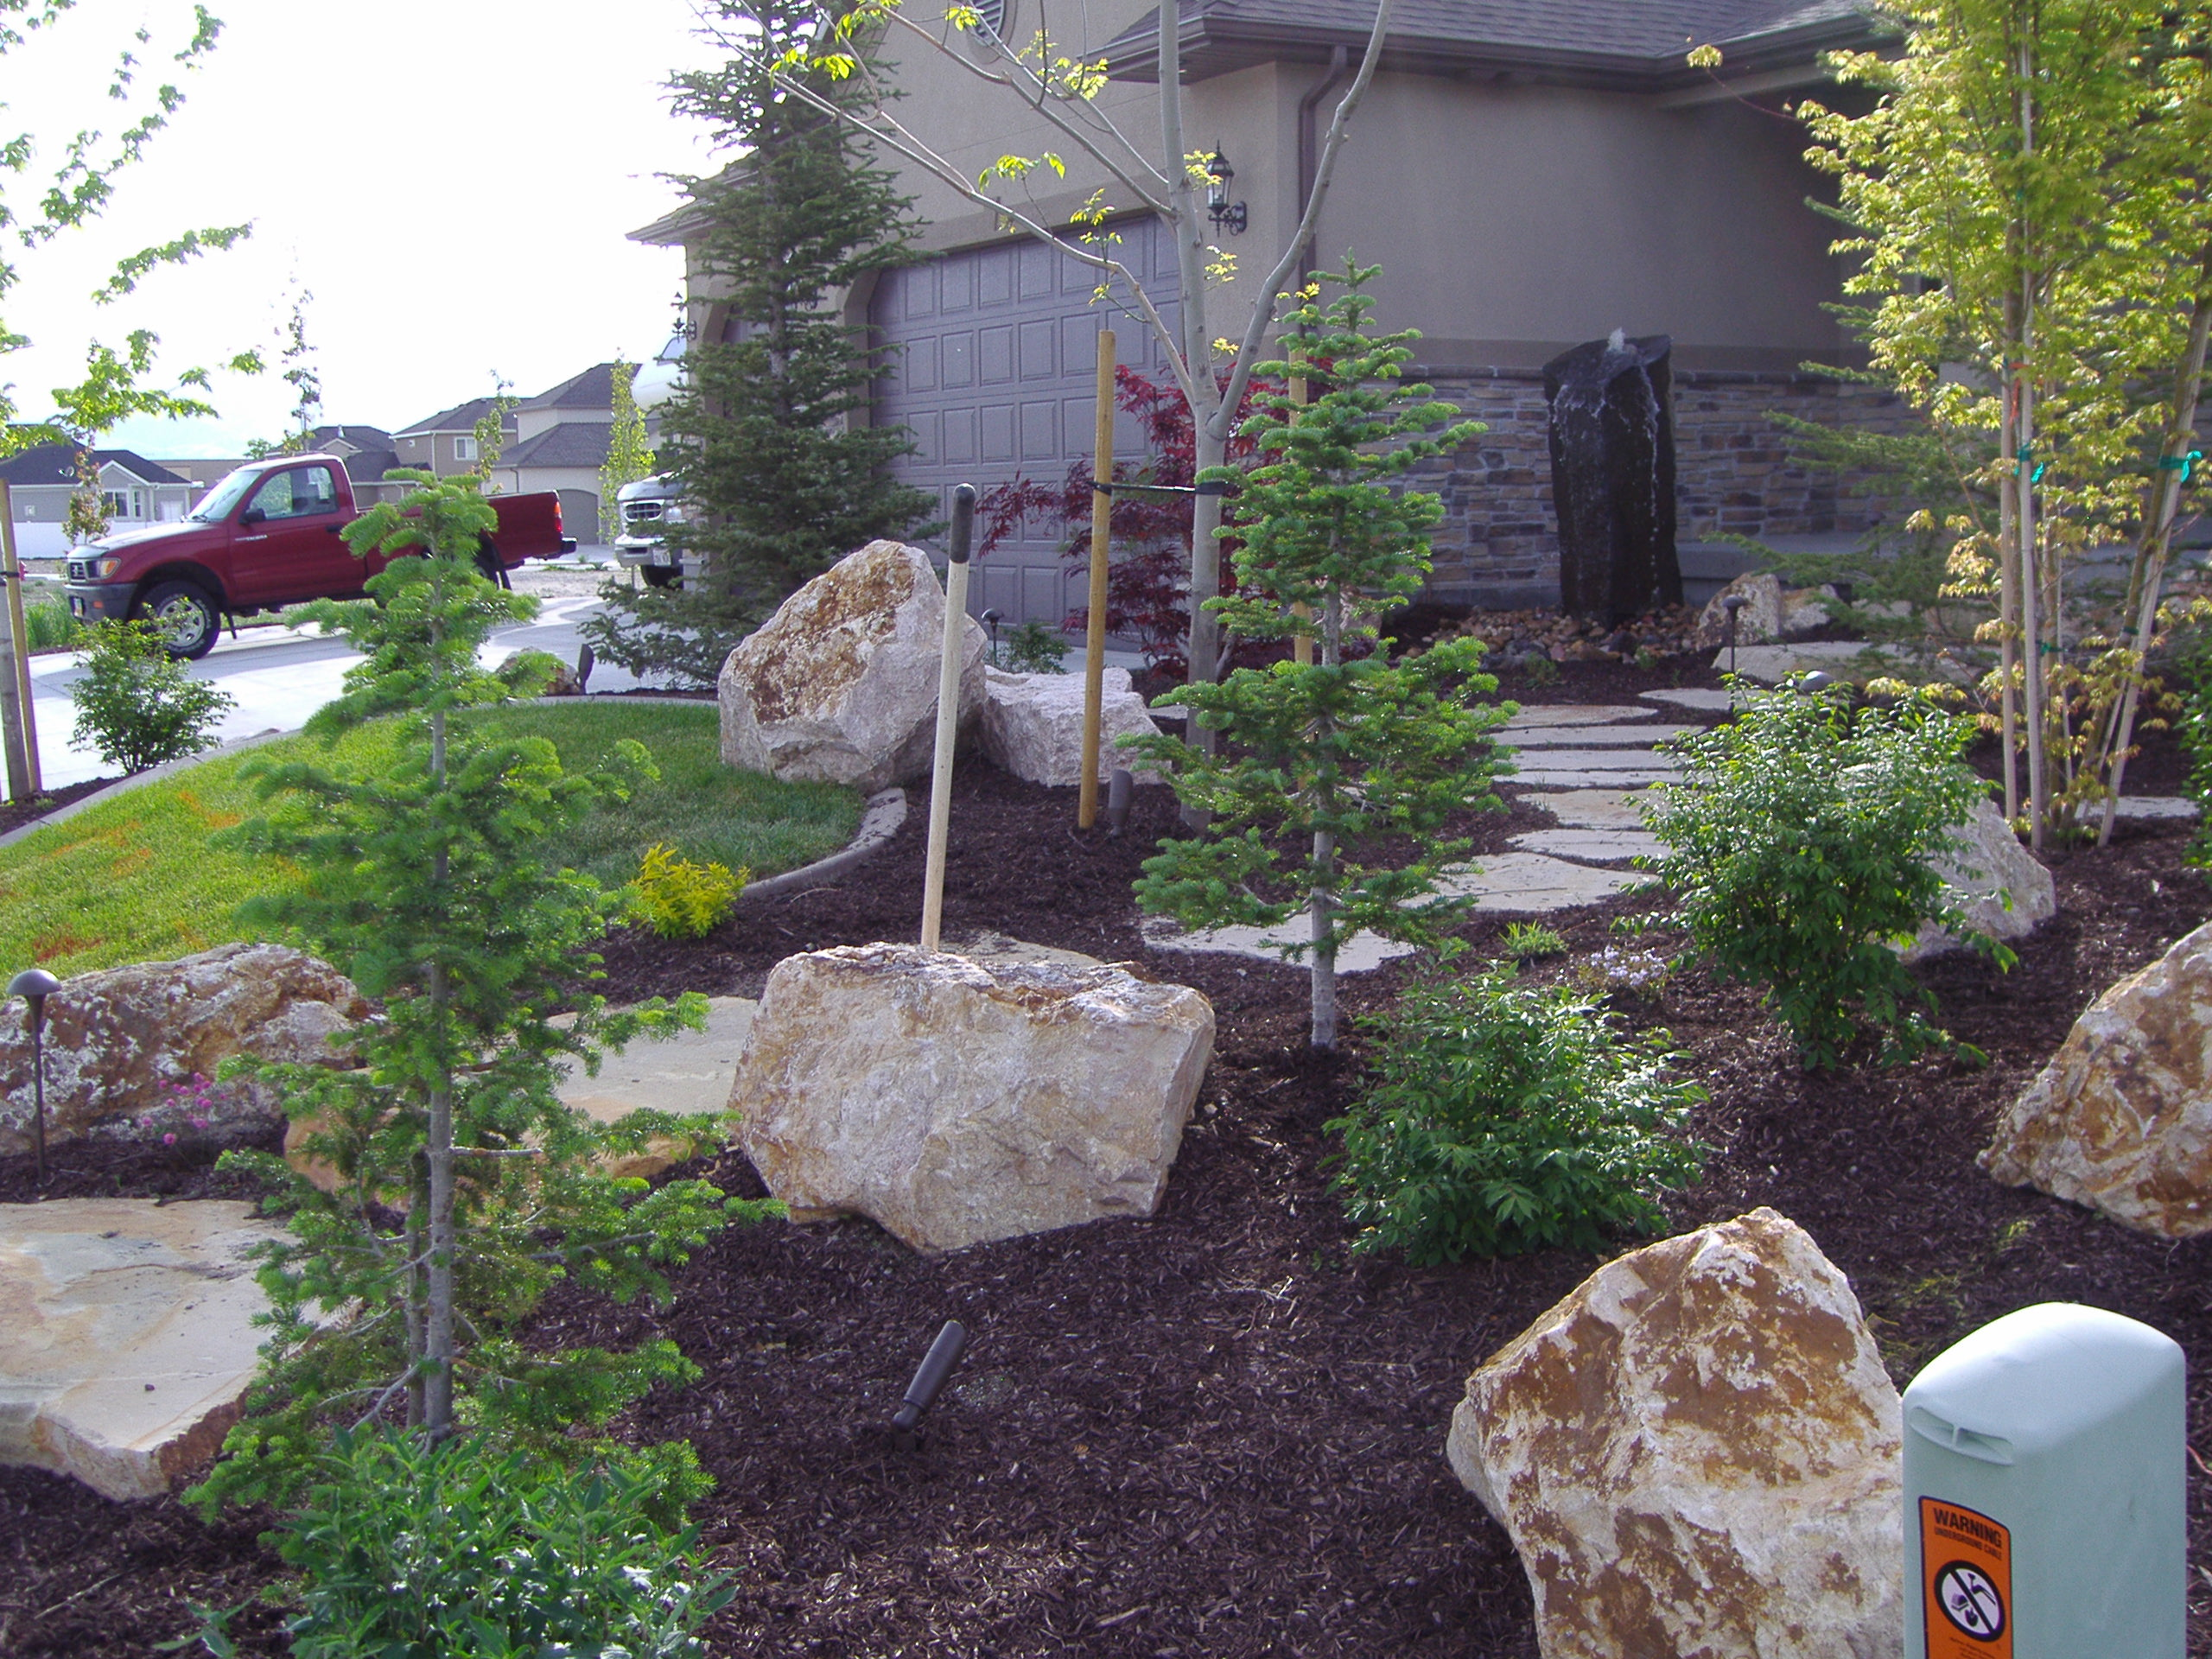 Utah landscapers landscaping relandscaping and adding for Landscaping rocks utah county